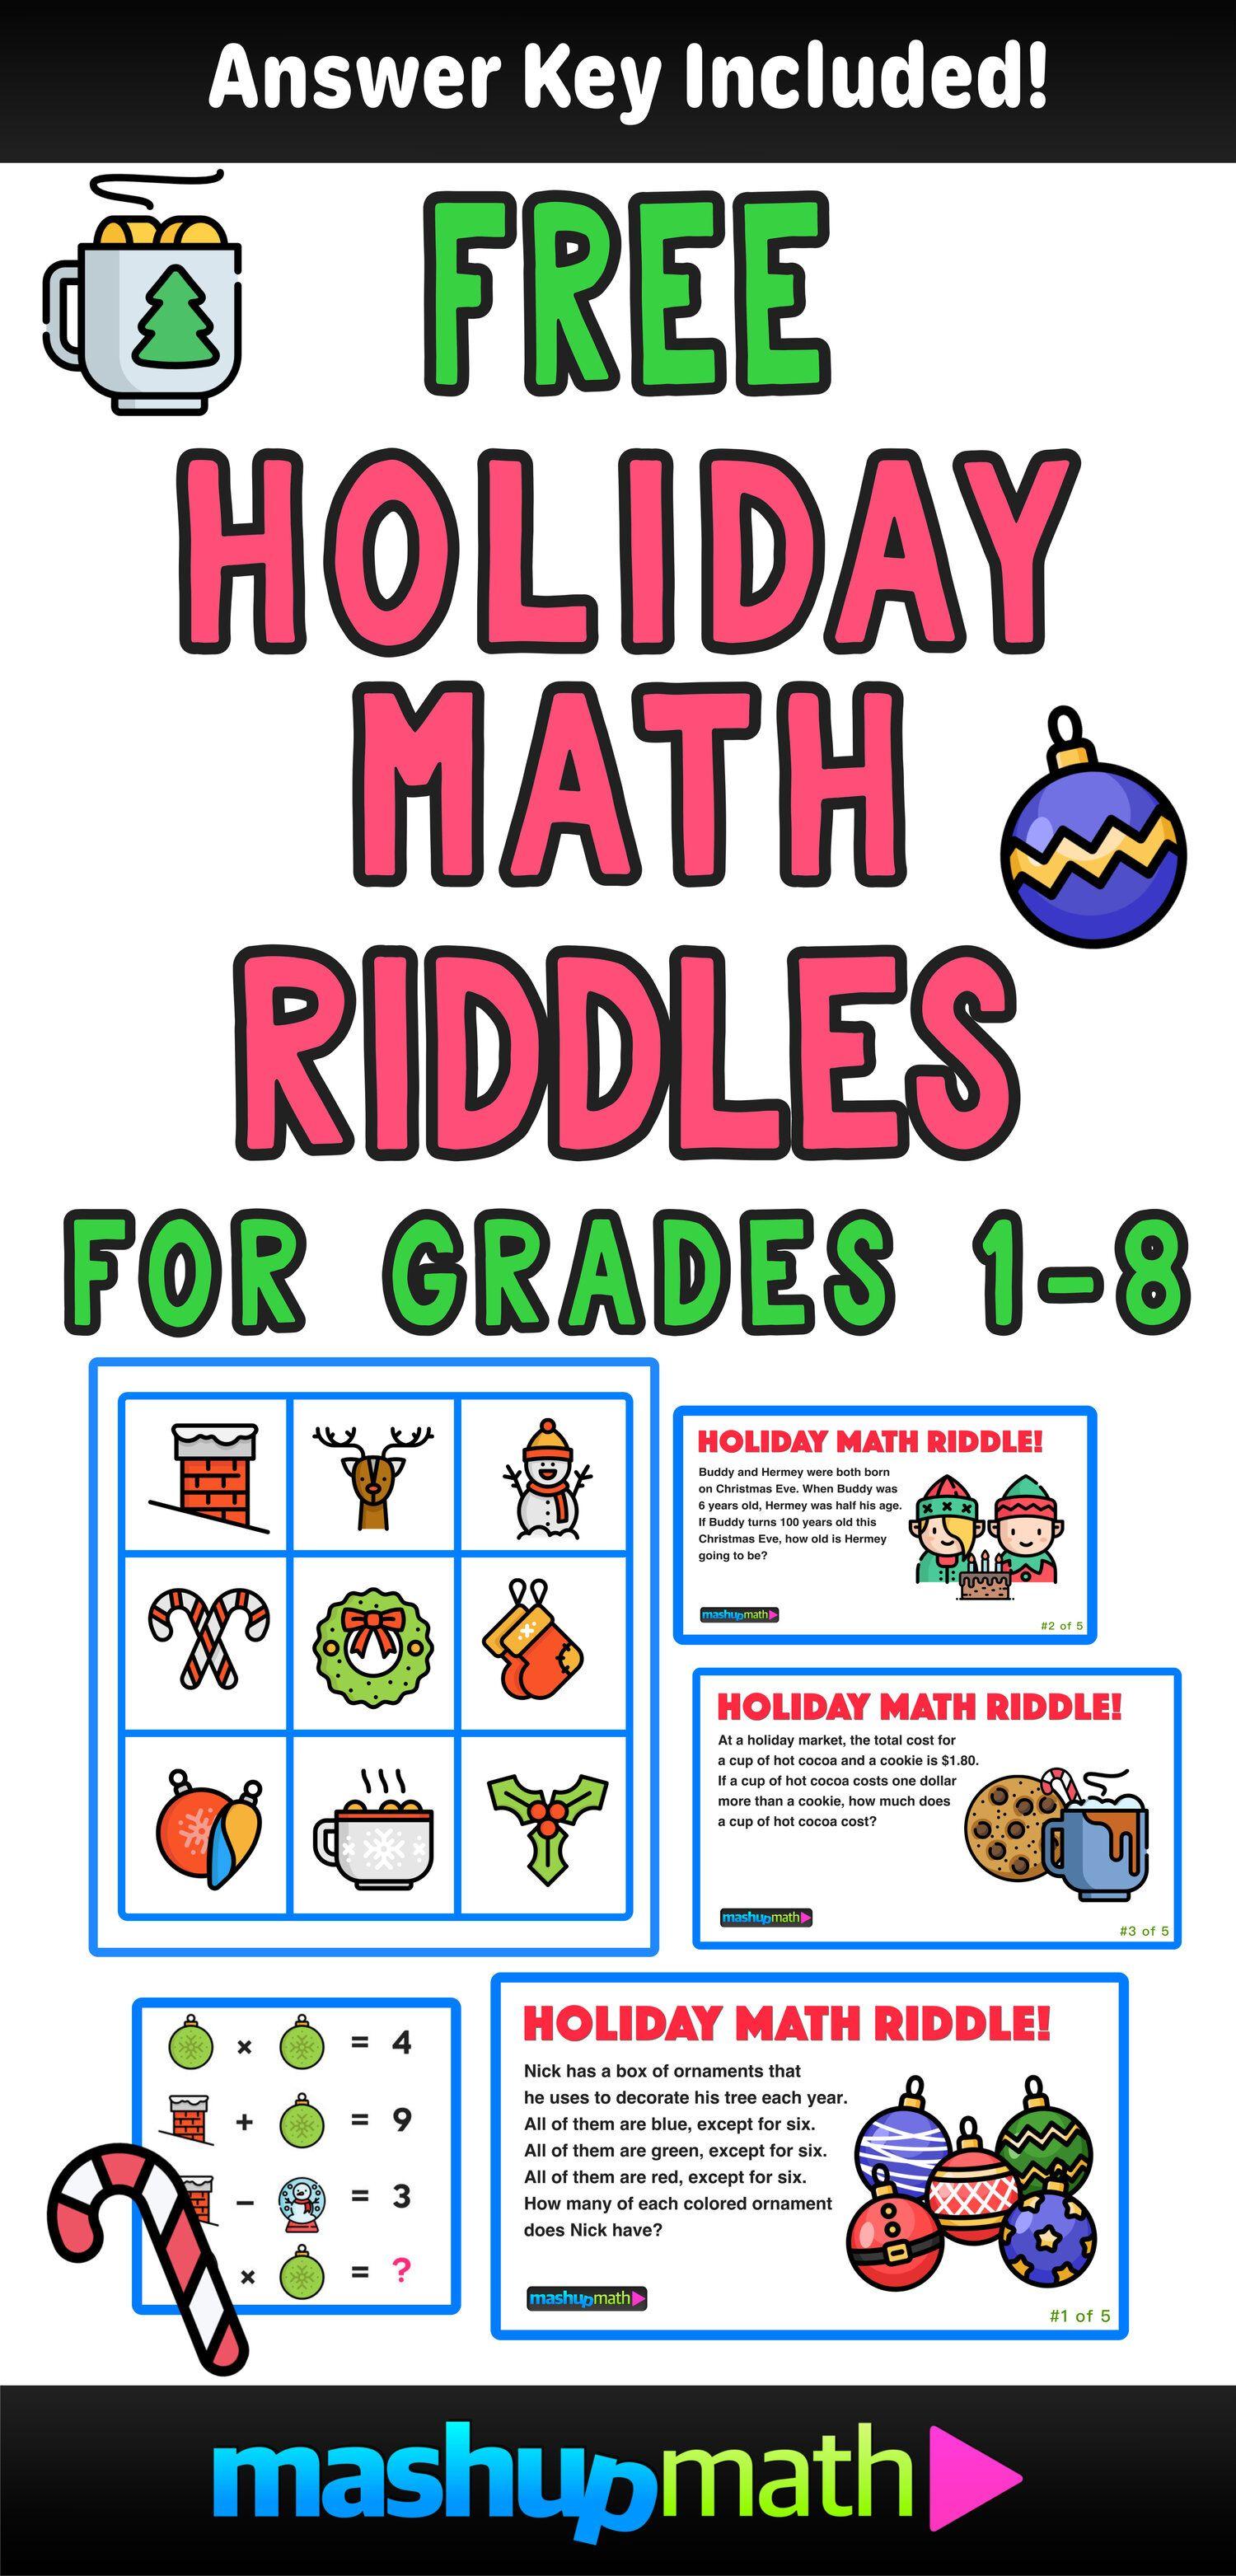 5 Fun Christmas Math Riddles And Brain Teasers For Grades 1 8 Mashup Math Holiday Math Christmas Math Math Riddles [ 3126 x 1500 Pixel ]